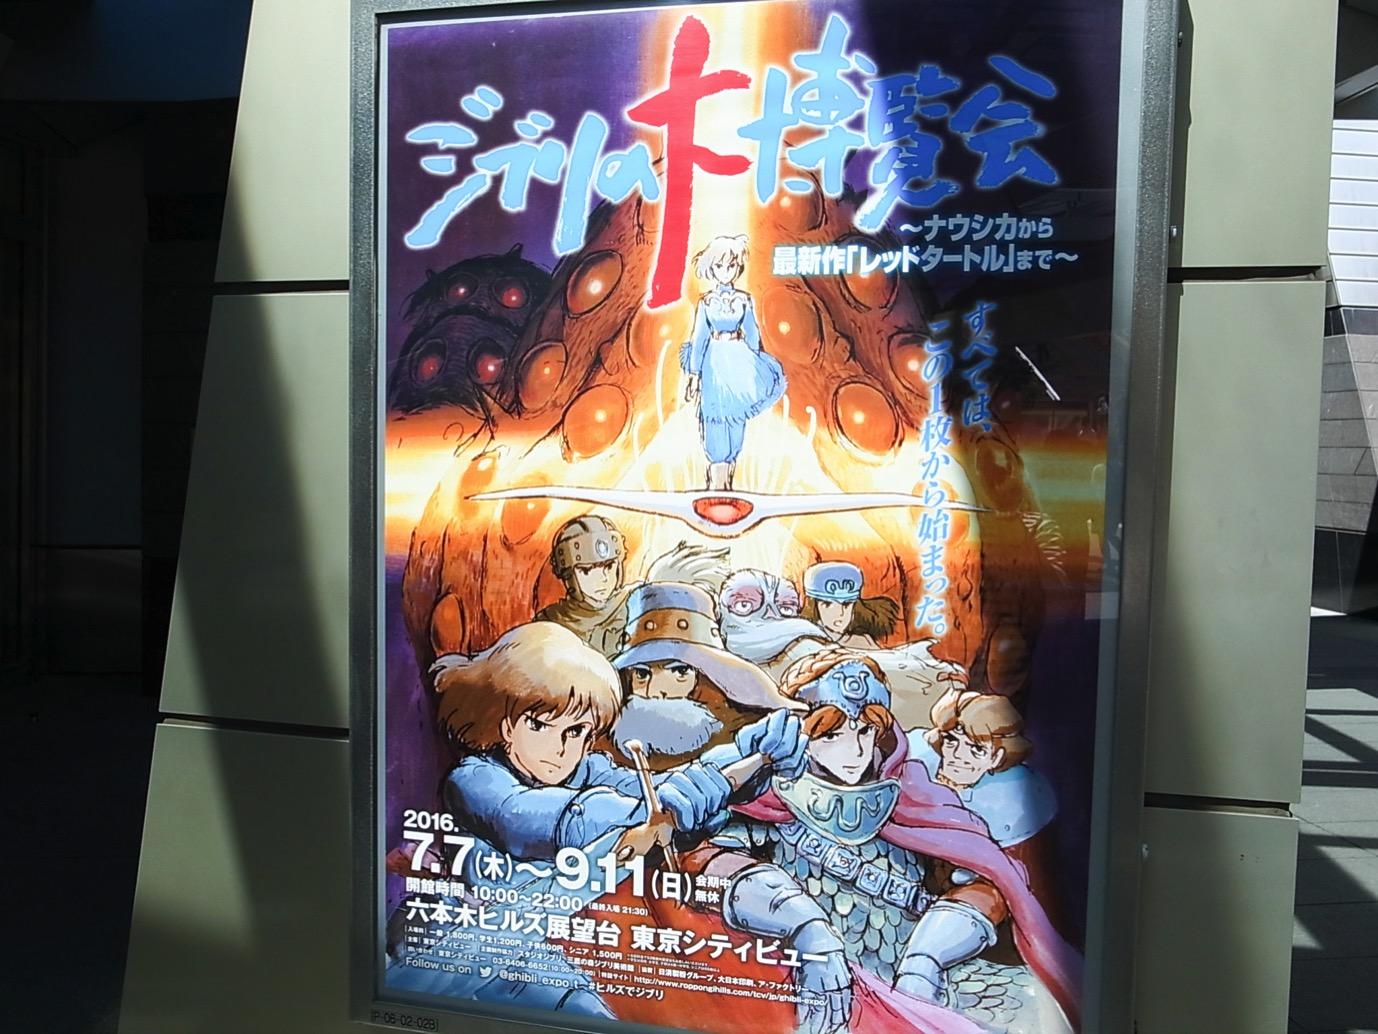 Ghibli expo 1